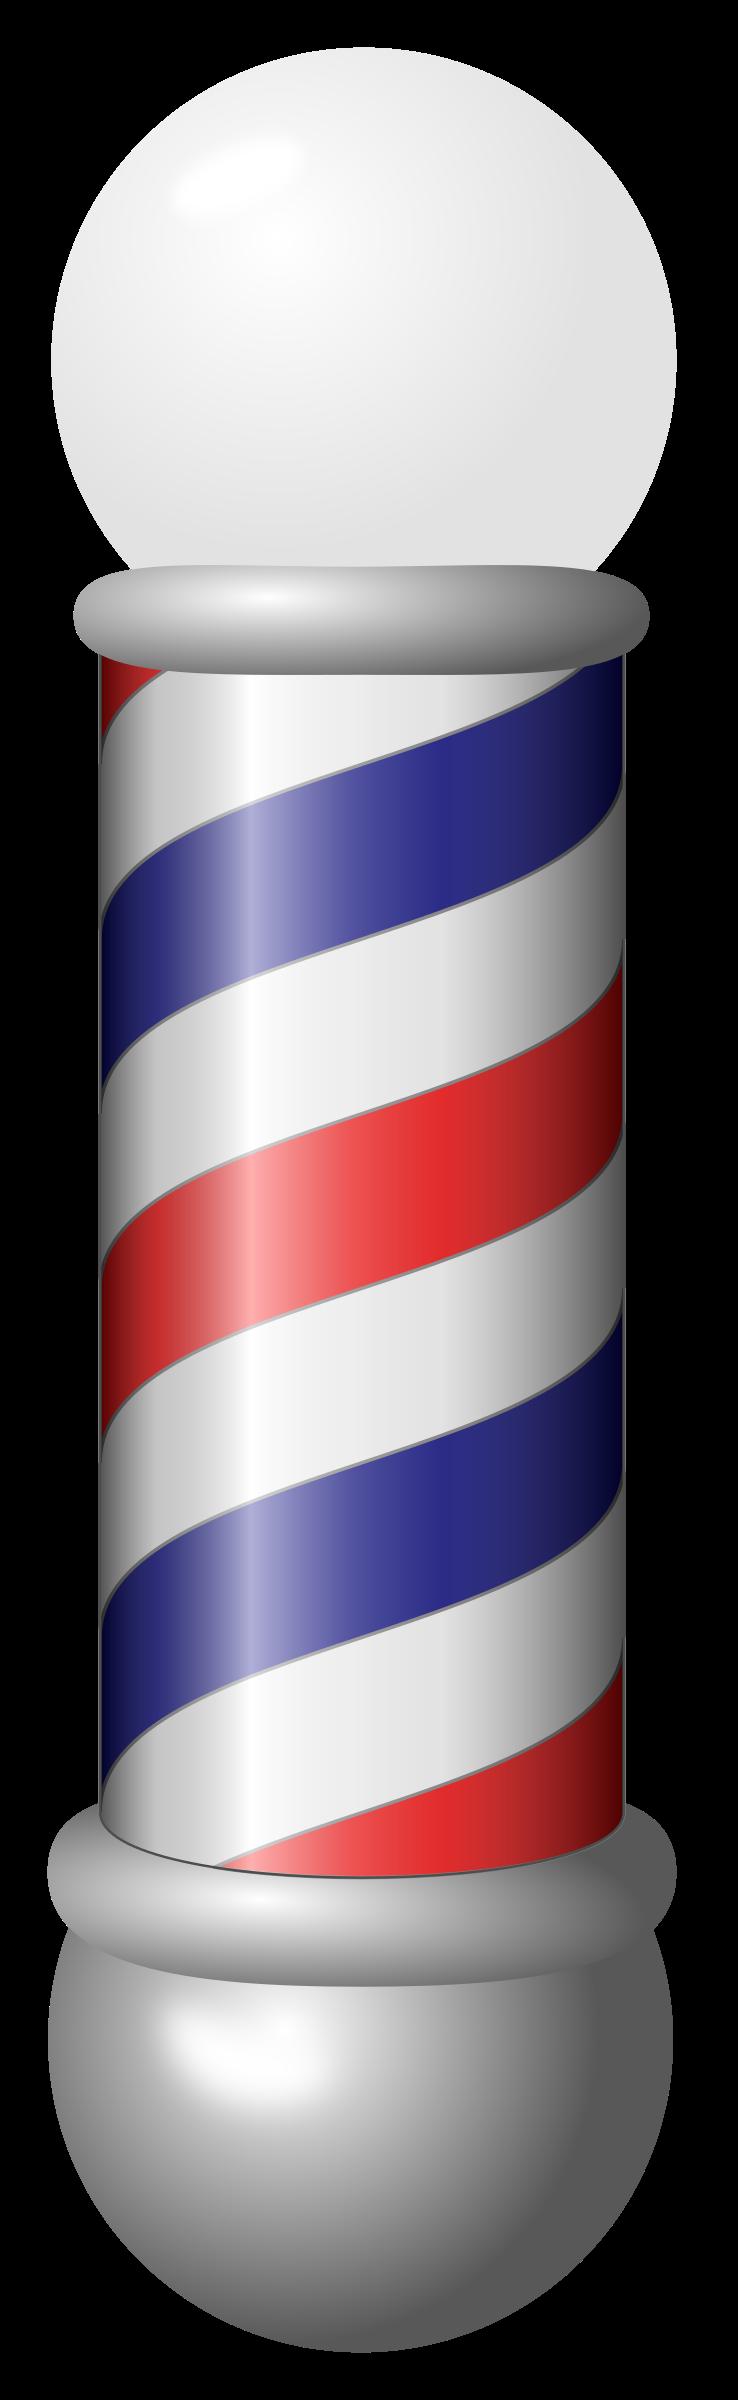 Barber Pole PNG HD - 126889